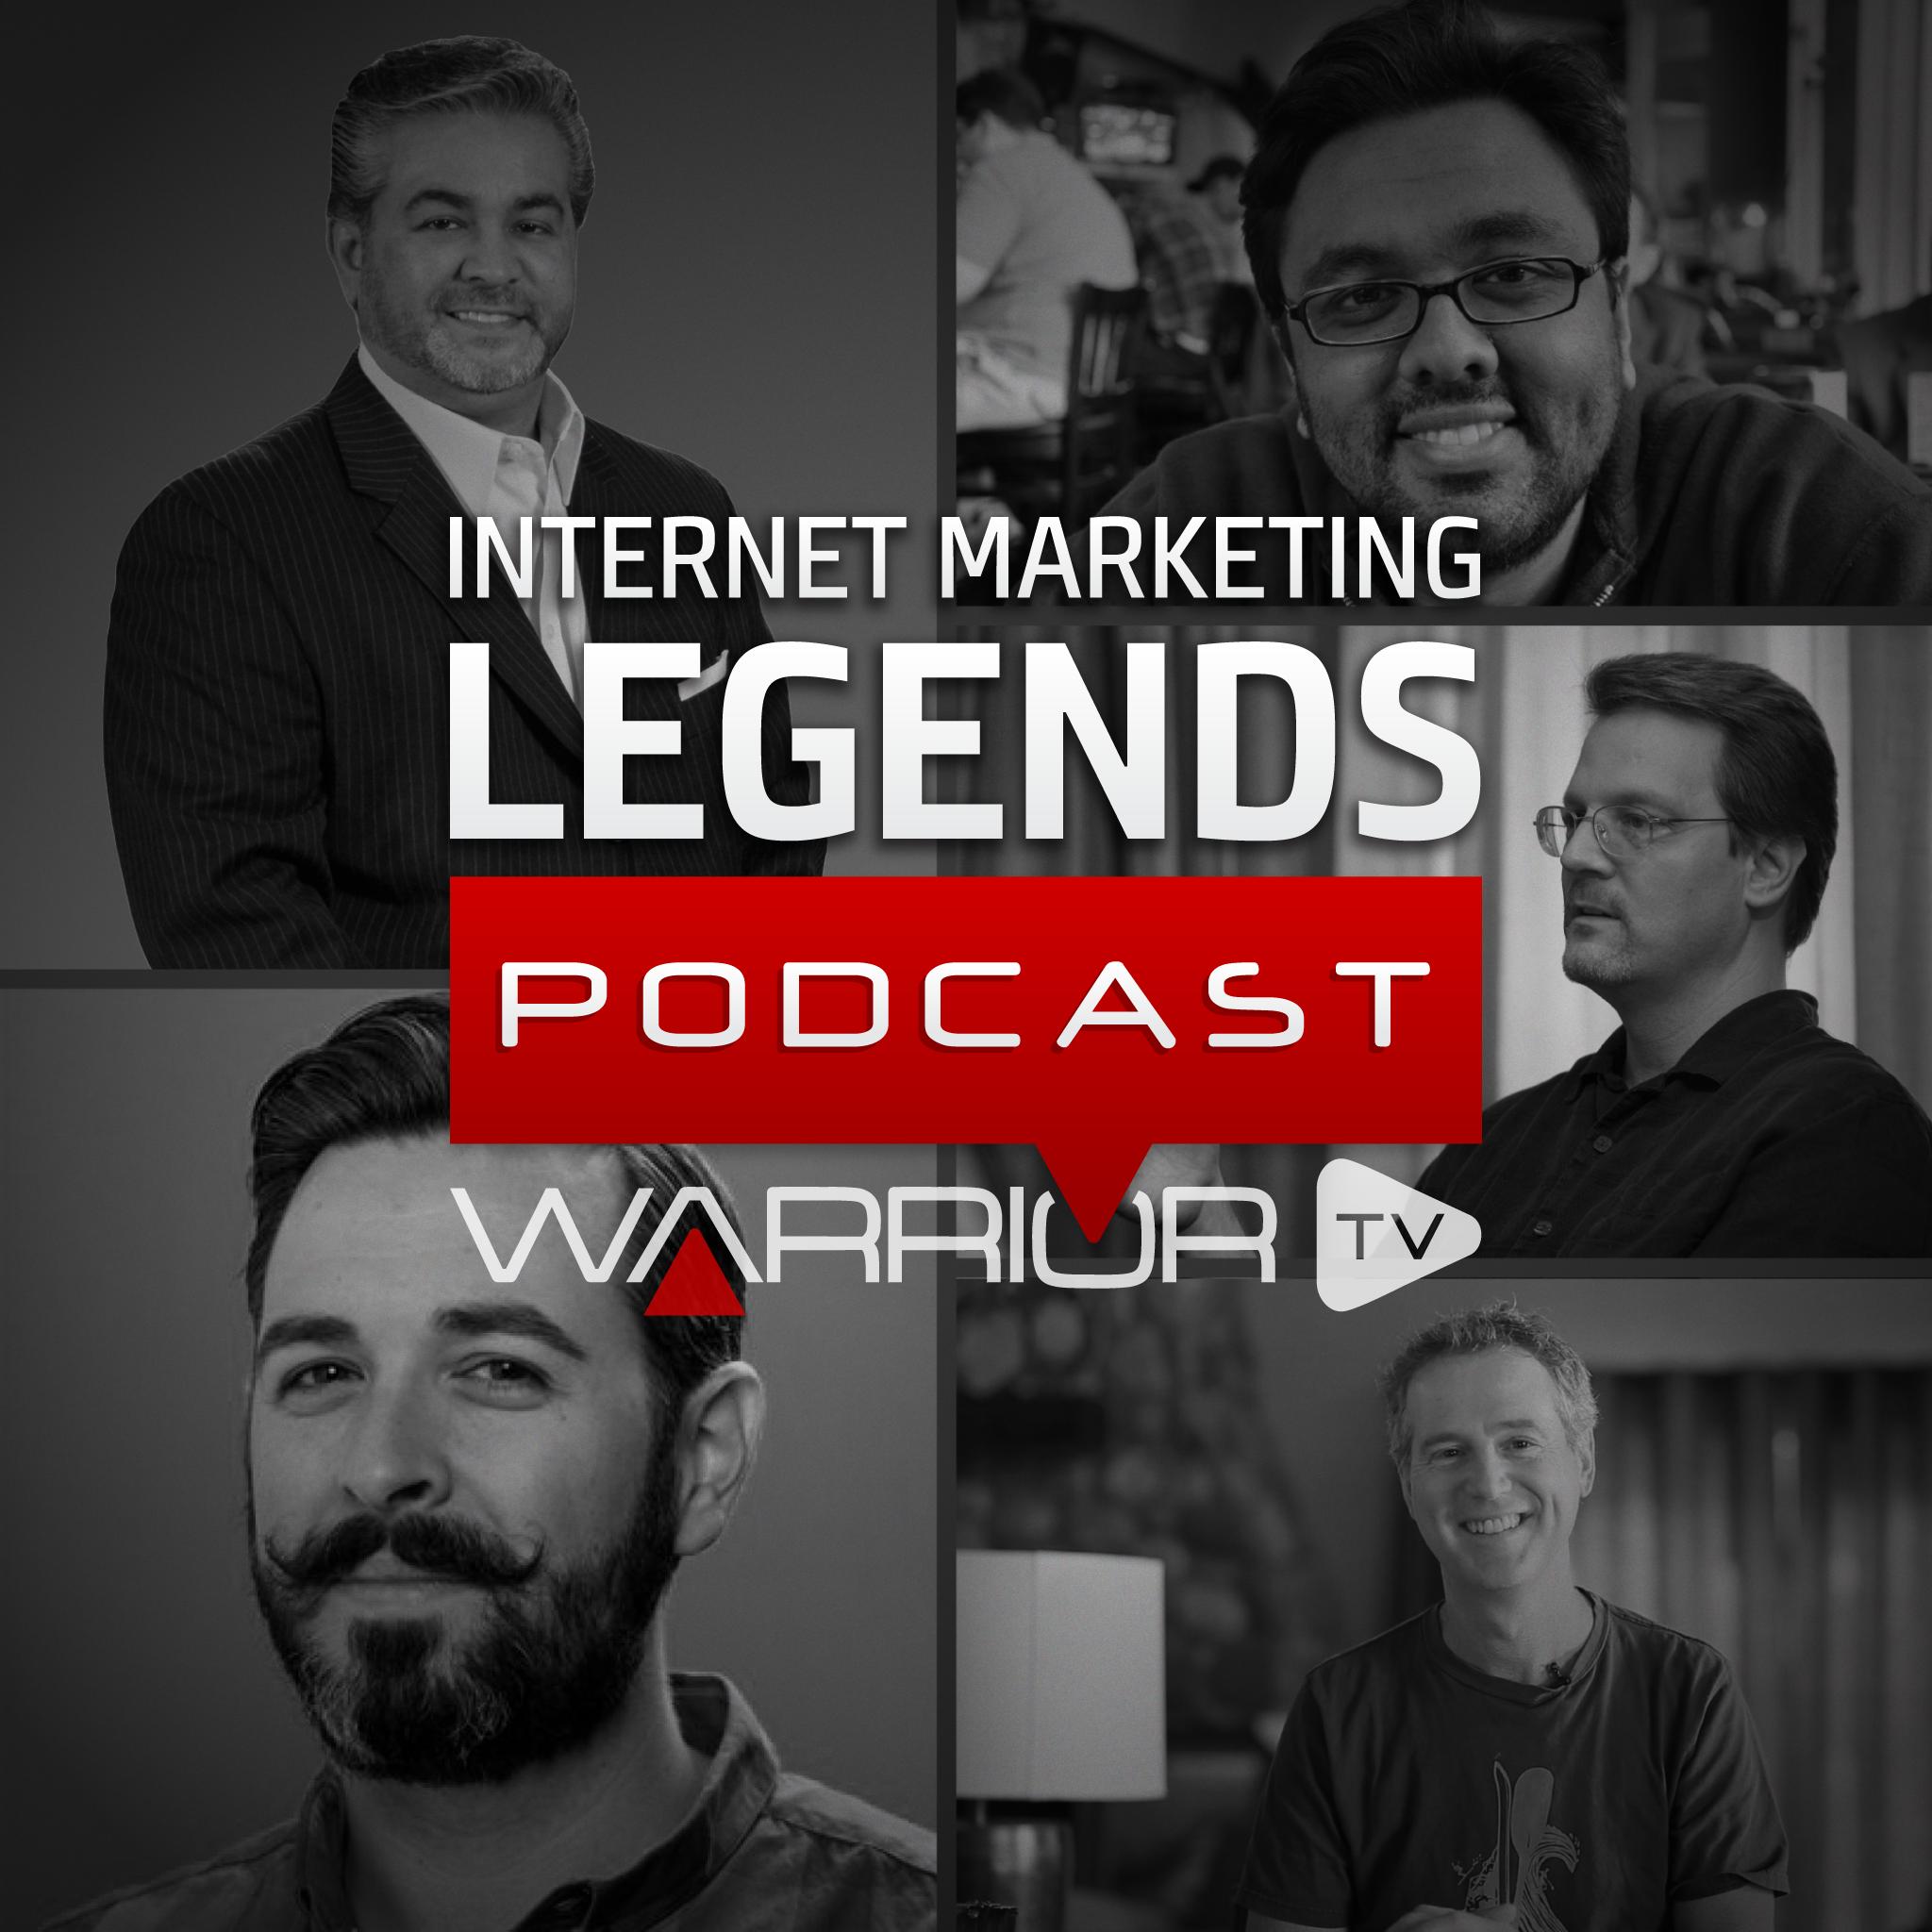 Warrior TV Audio Podcast